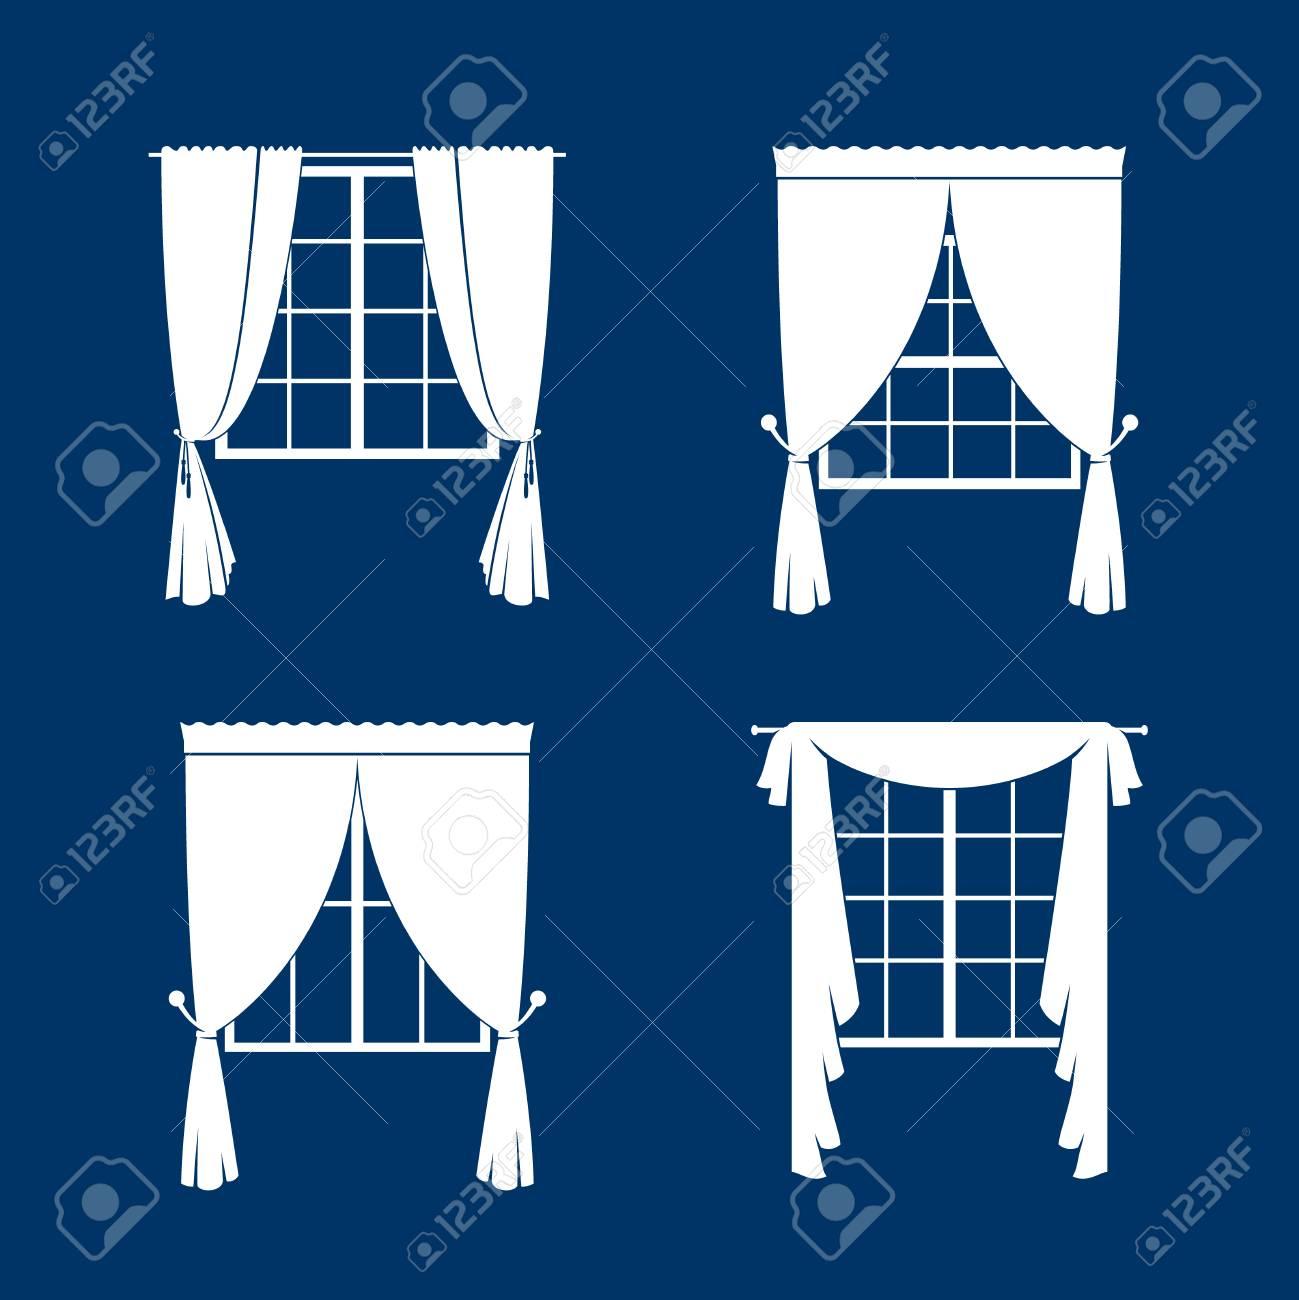 https://previews.123rf.com/images/ssstocker/ssstocker1605/ssstocker160500039/57171760-window-curtains-set-white-curtans-and-windows-silhouette-on-blue-vackground-vector-illustration.jpg